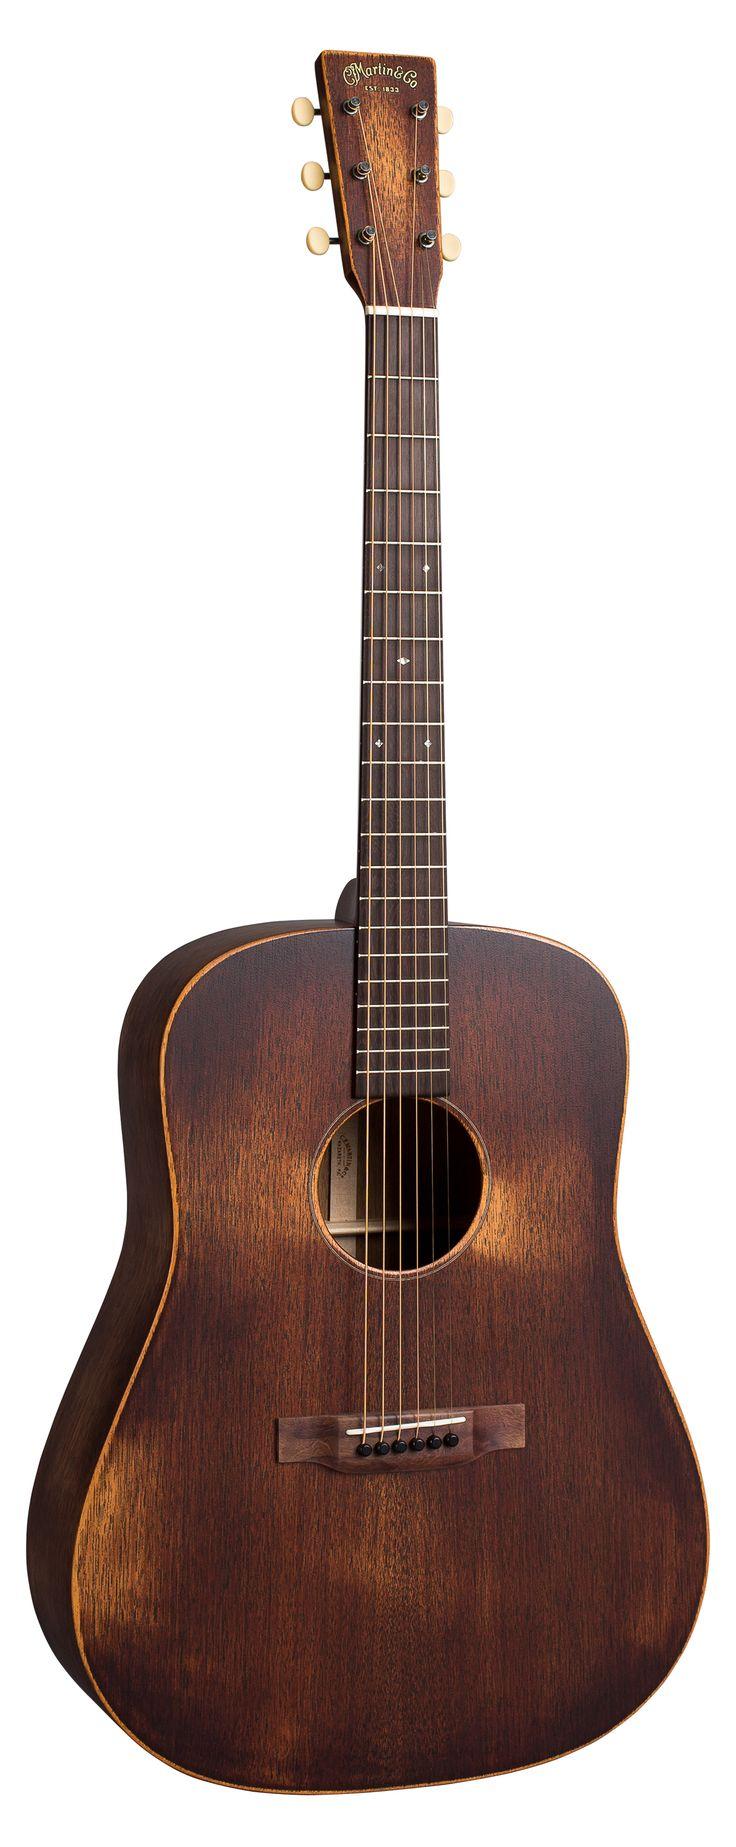 Acoustic Guitars   C.F. Martin & Co.